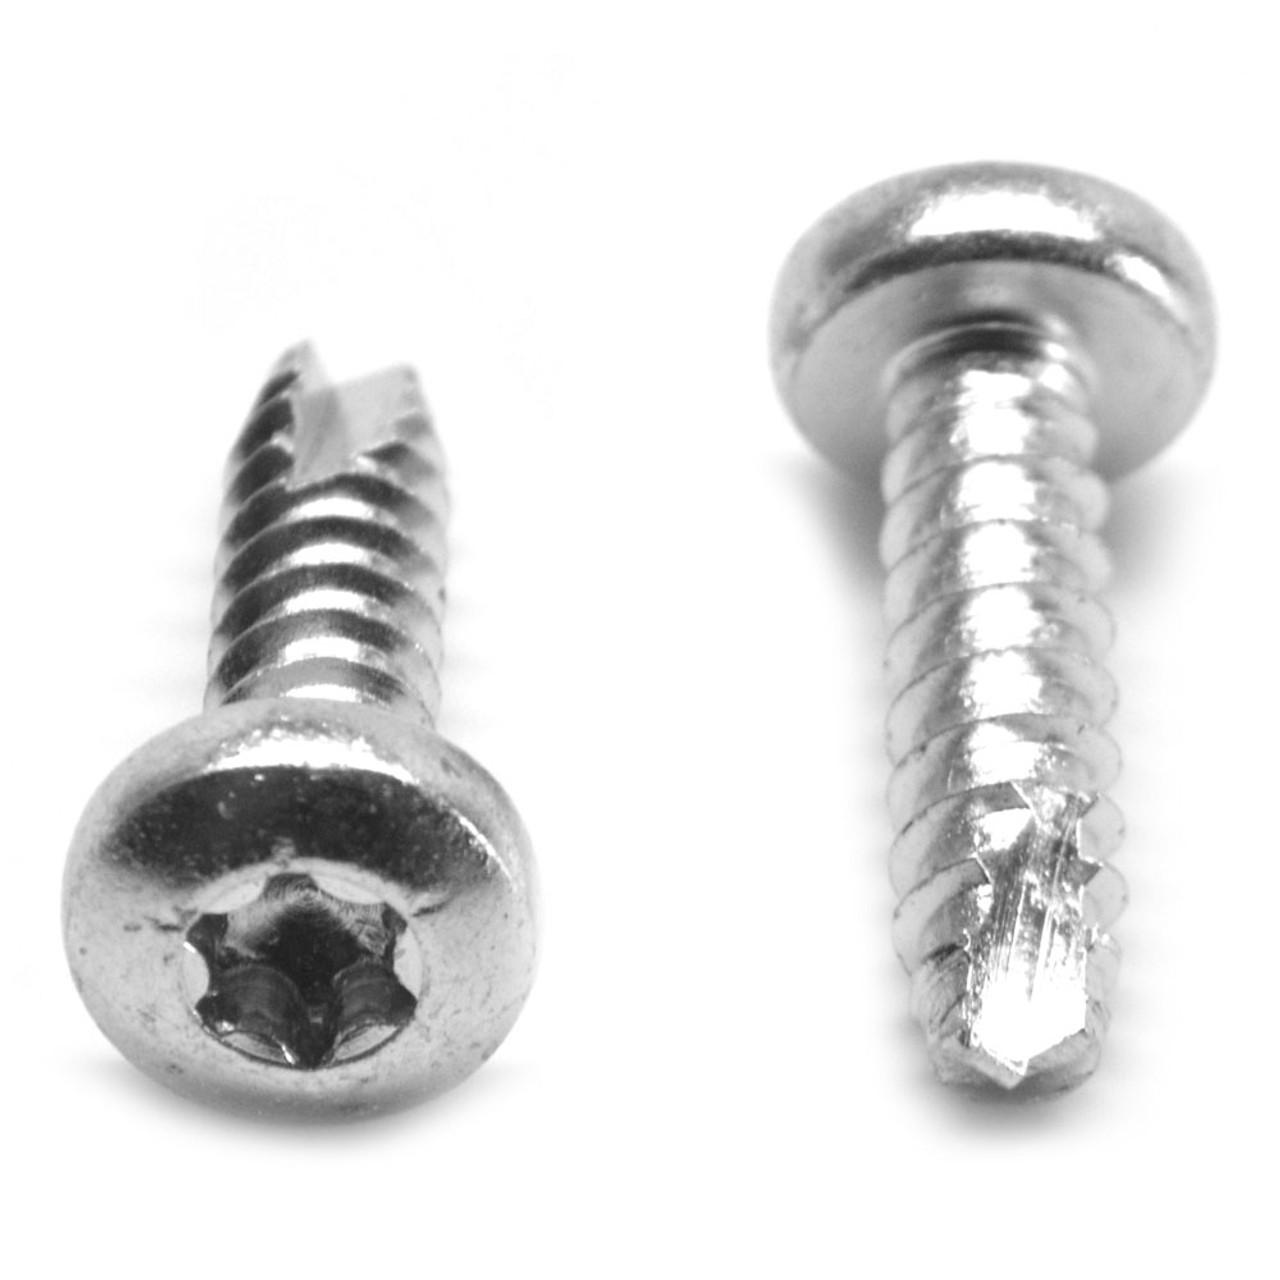 #8-18 x 3/8 Thread Cutting Screw 6 Lobe Pan Head Type 25 Stainless Steel 18-8